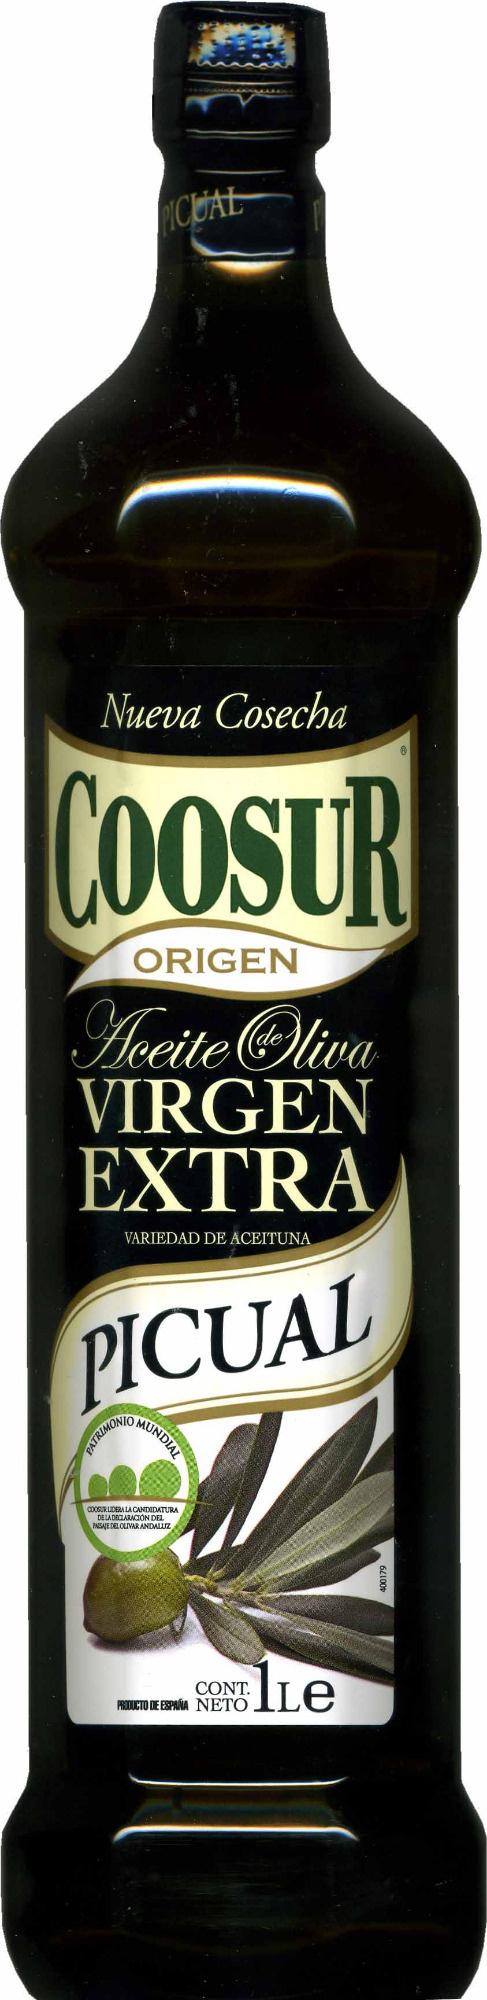 Aceite de oliva virgen extra Picual intenso botella 1 l - Producto - es